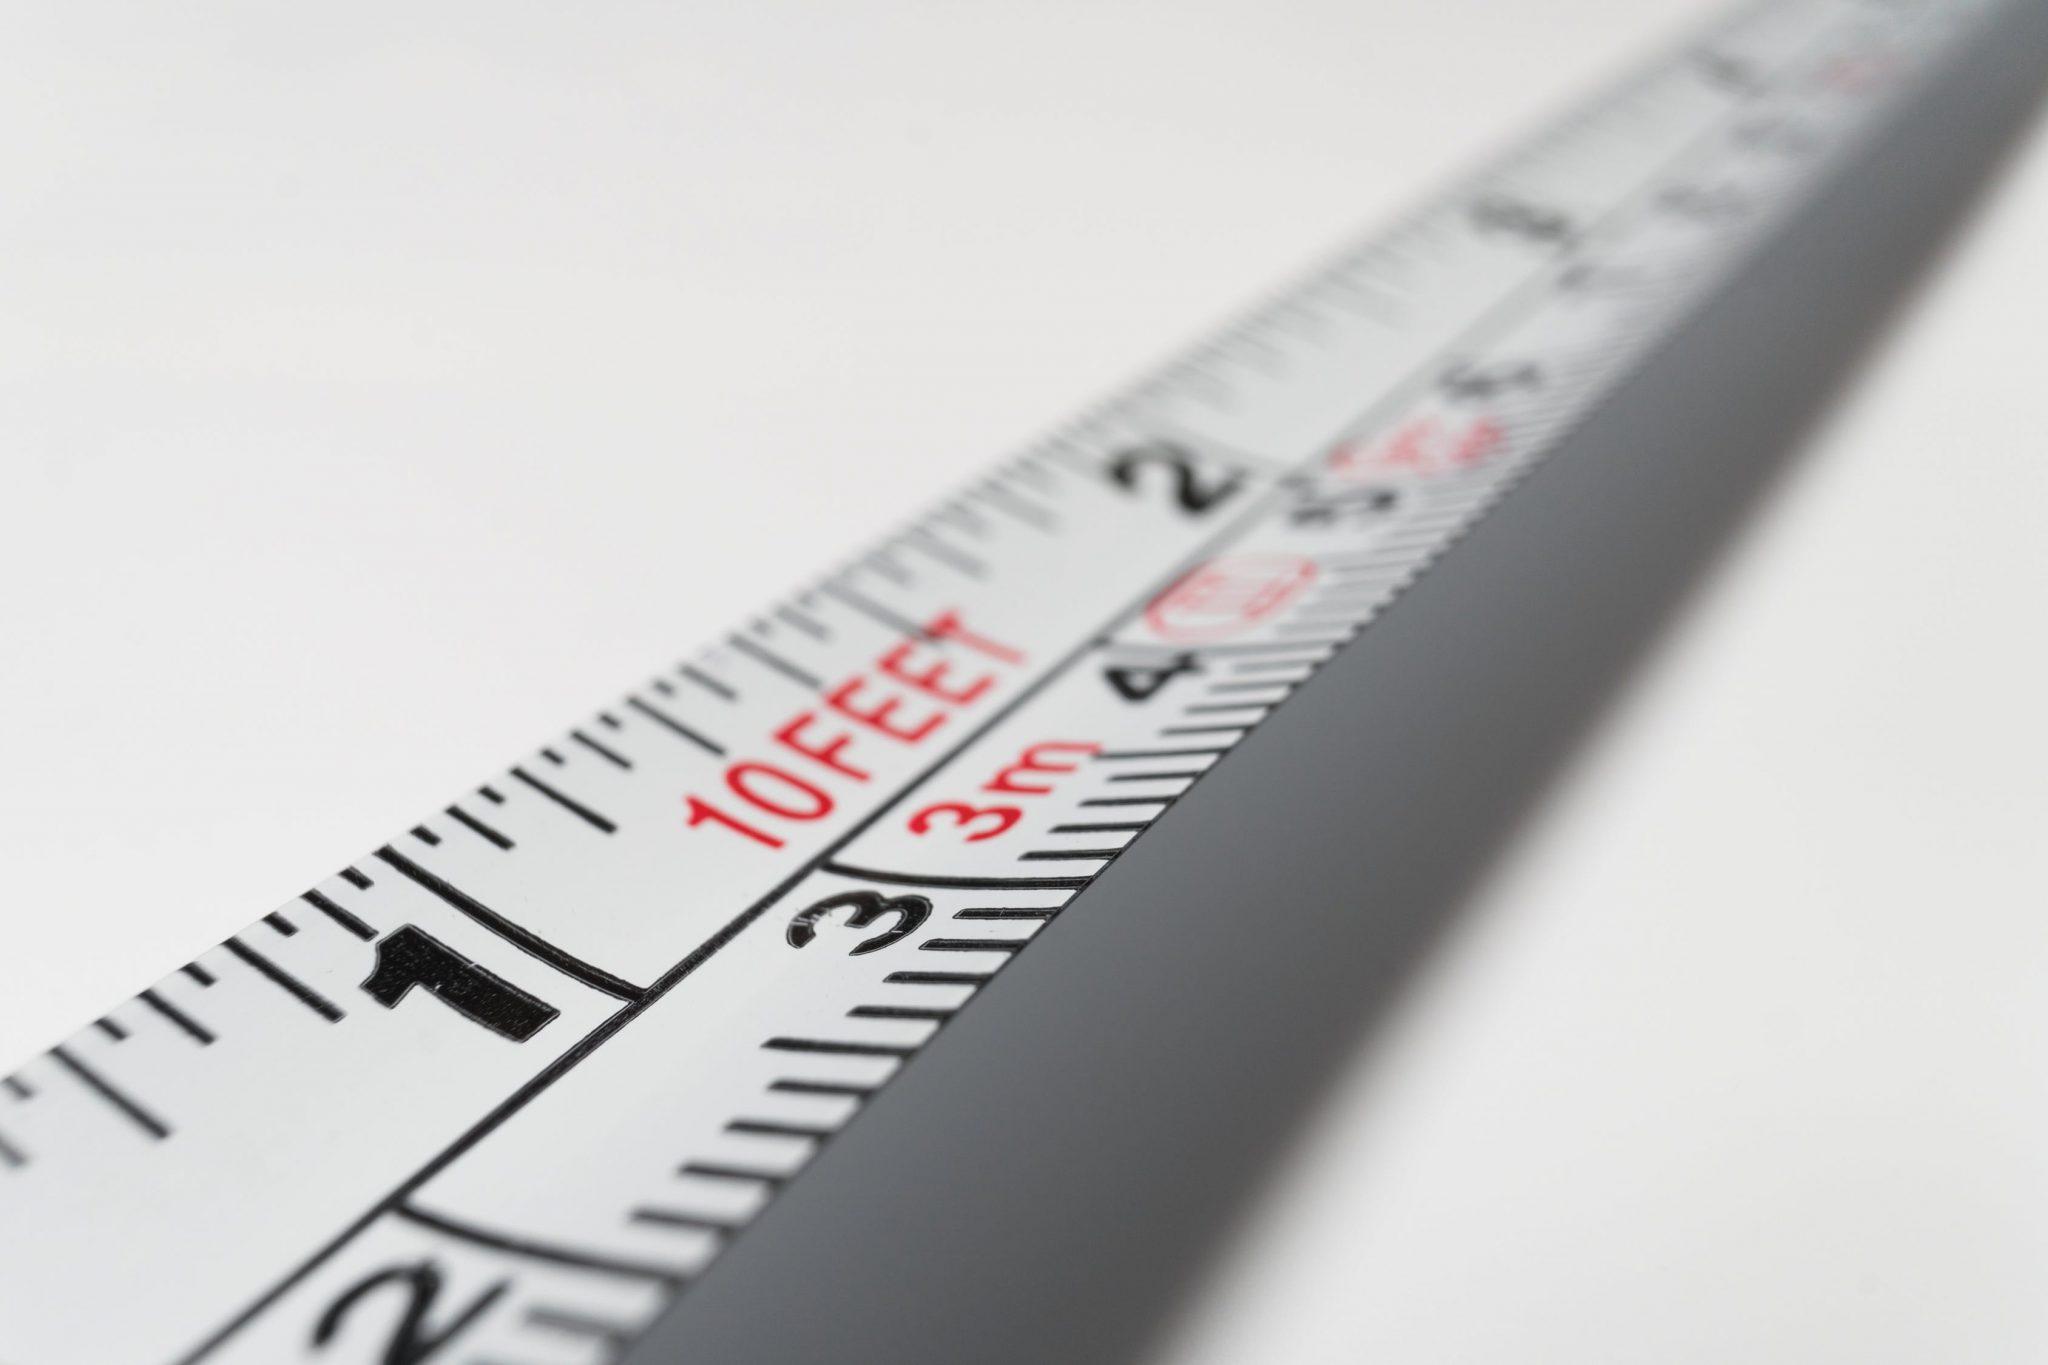 Maßeinheiten selbst ausdenken; Maßband; Meter; Längenangaben; Zeitangaben